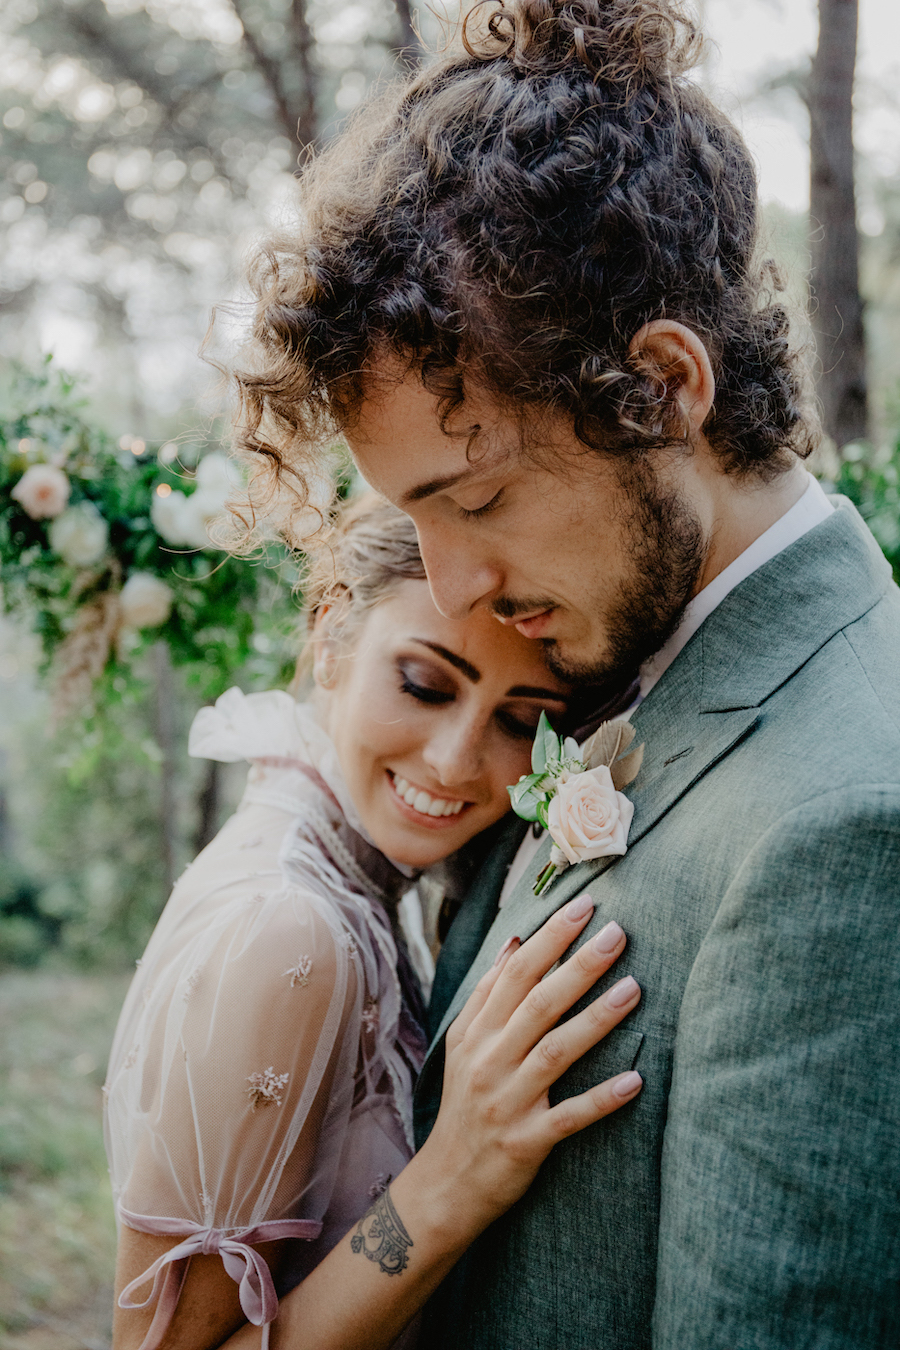 matrimonio-a-tema-stelle-in-pineta-federica-cosentino-15.jpg